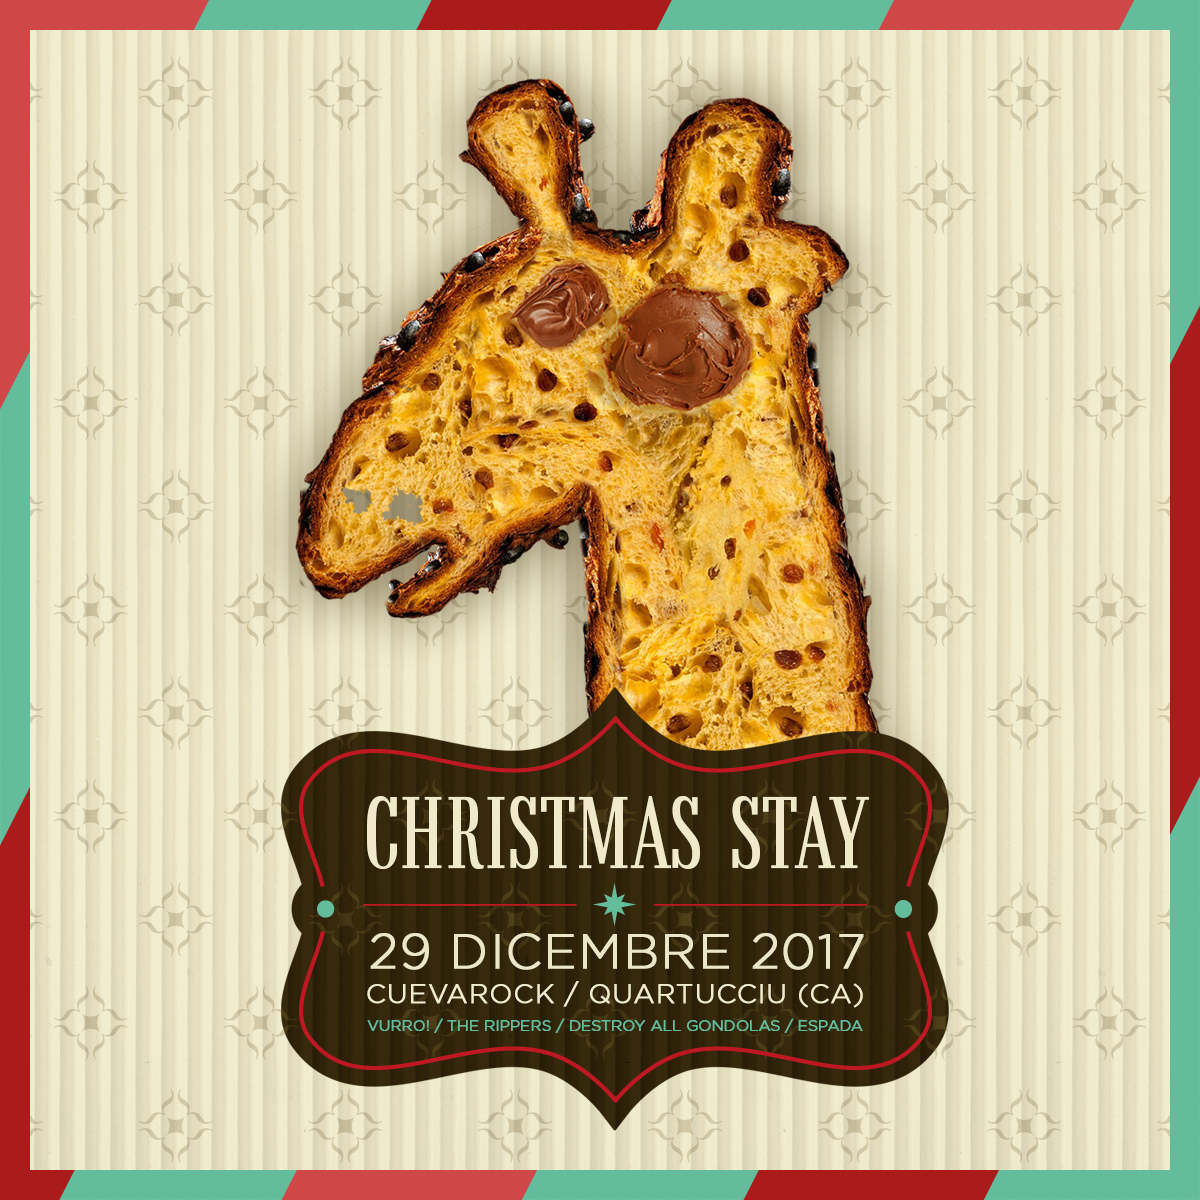 CHRISTMAS STAY 2017